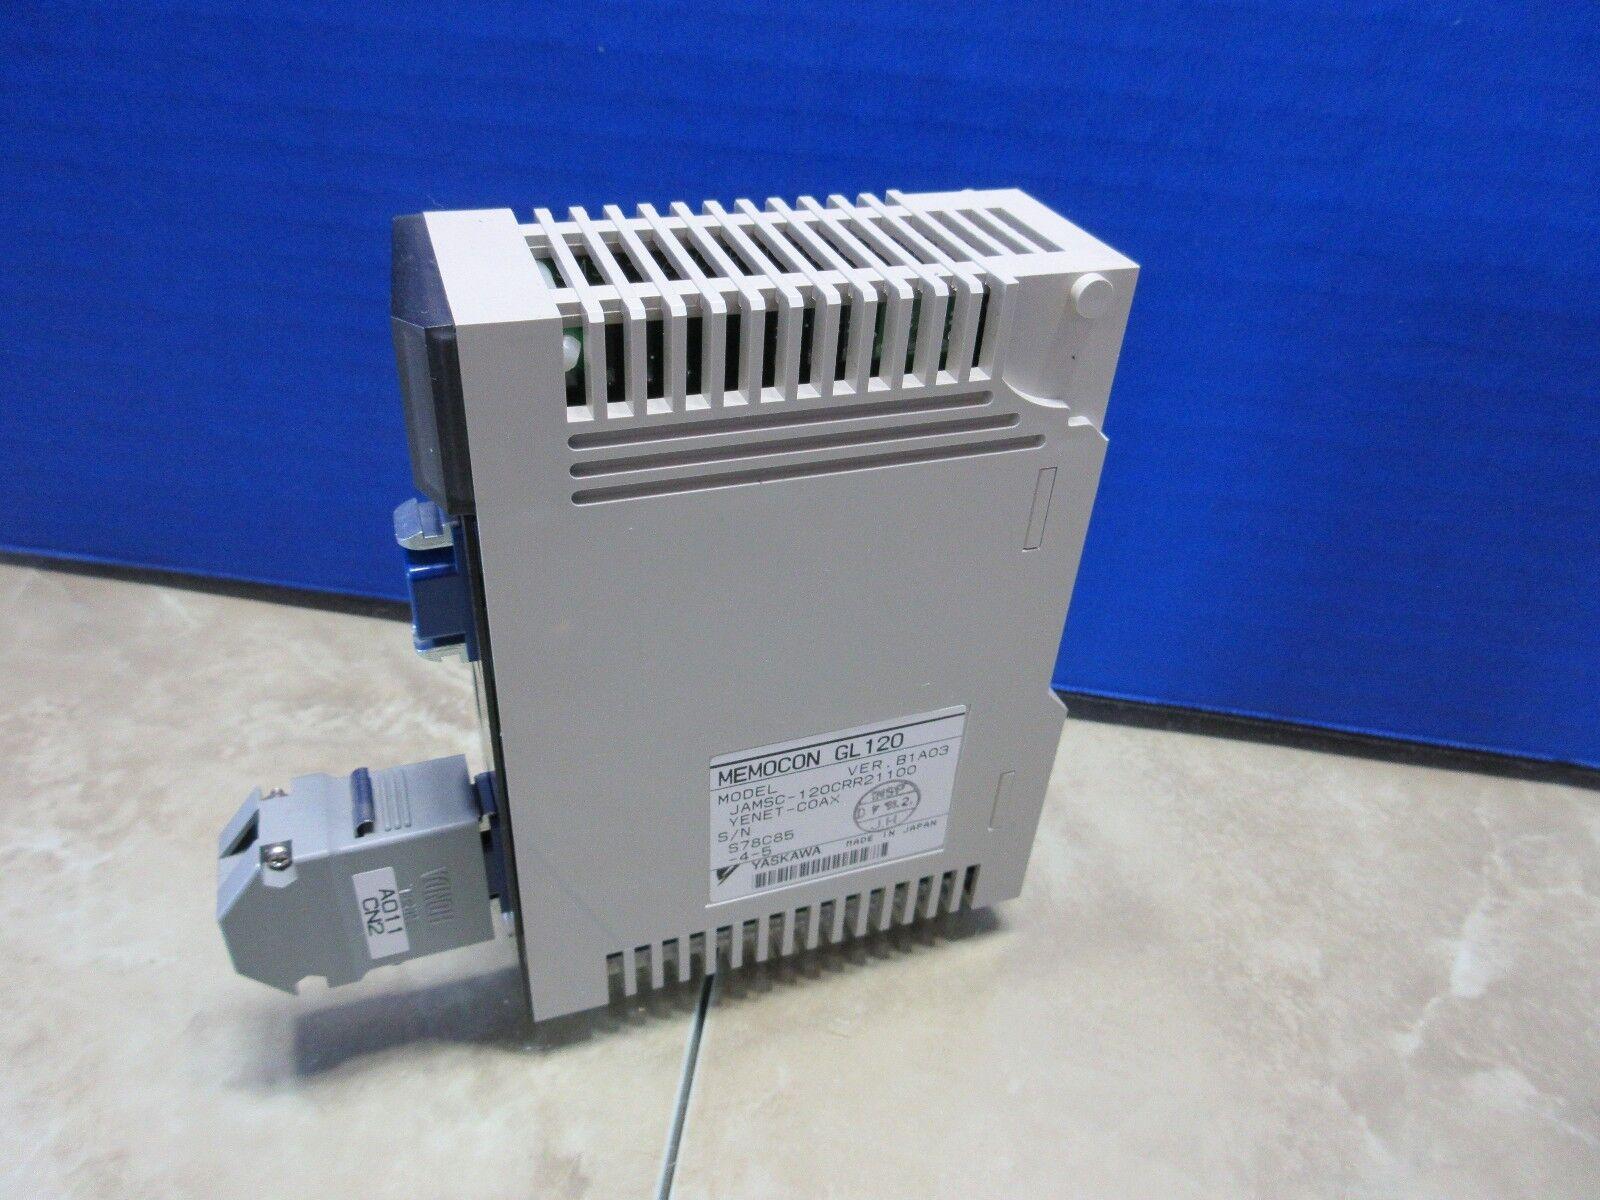 Yaskawa 120CRR21100 módulo de salida de retransmisión retransmisión retransmisión memocon GL120 B1A03 jamsc - 120CRR21100 61e8f0